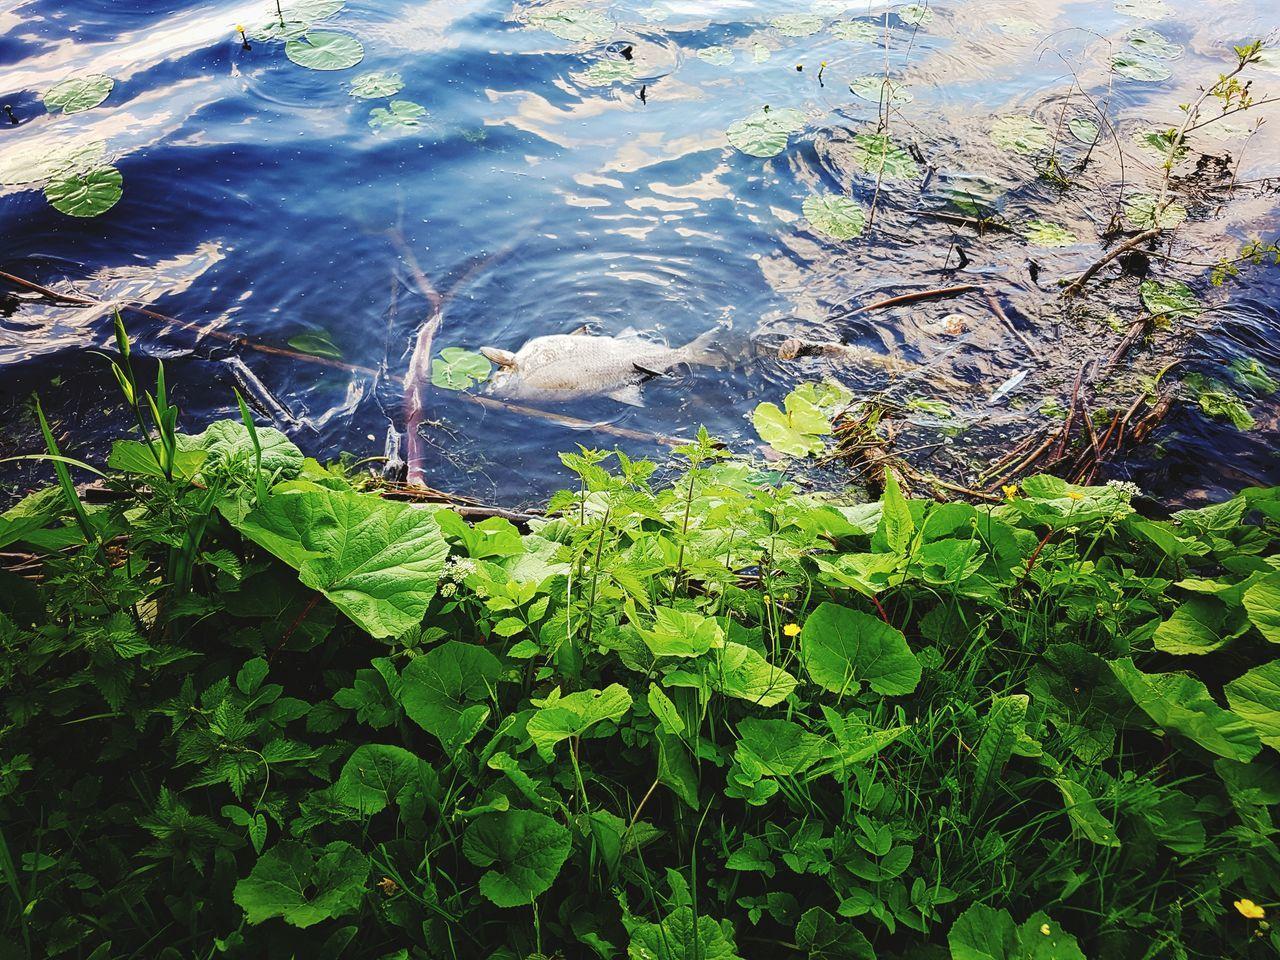 Water Nature Day Outdoors No People Green Color Lake Beauty In Nature Fish EyeEm Gallery Week On Eyeem Eyeemphotography EyeEm Best Shots Taking Photos Showcase:June Popular Photos Beliebte Fotos Eye4photography